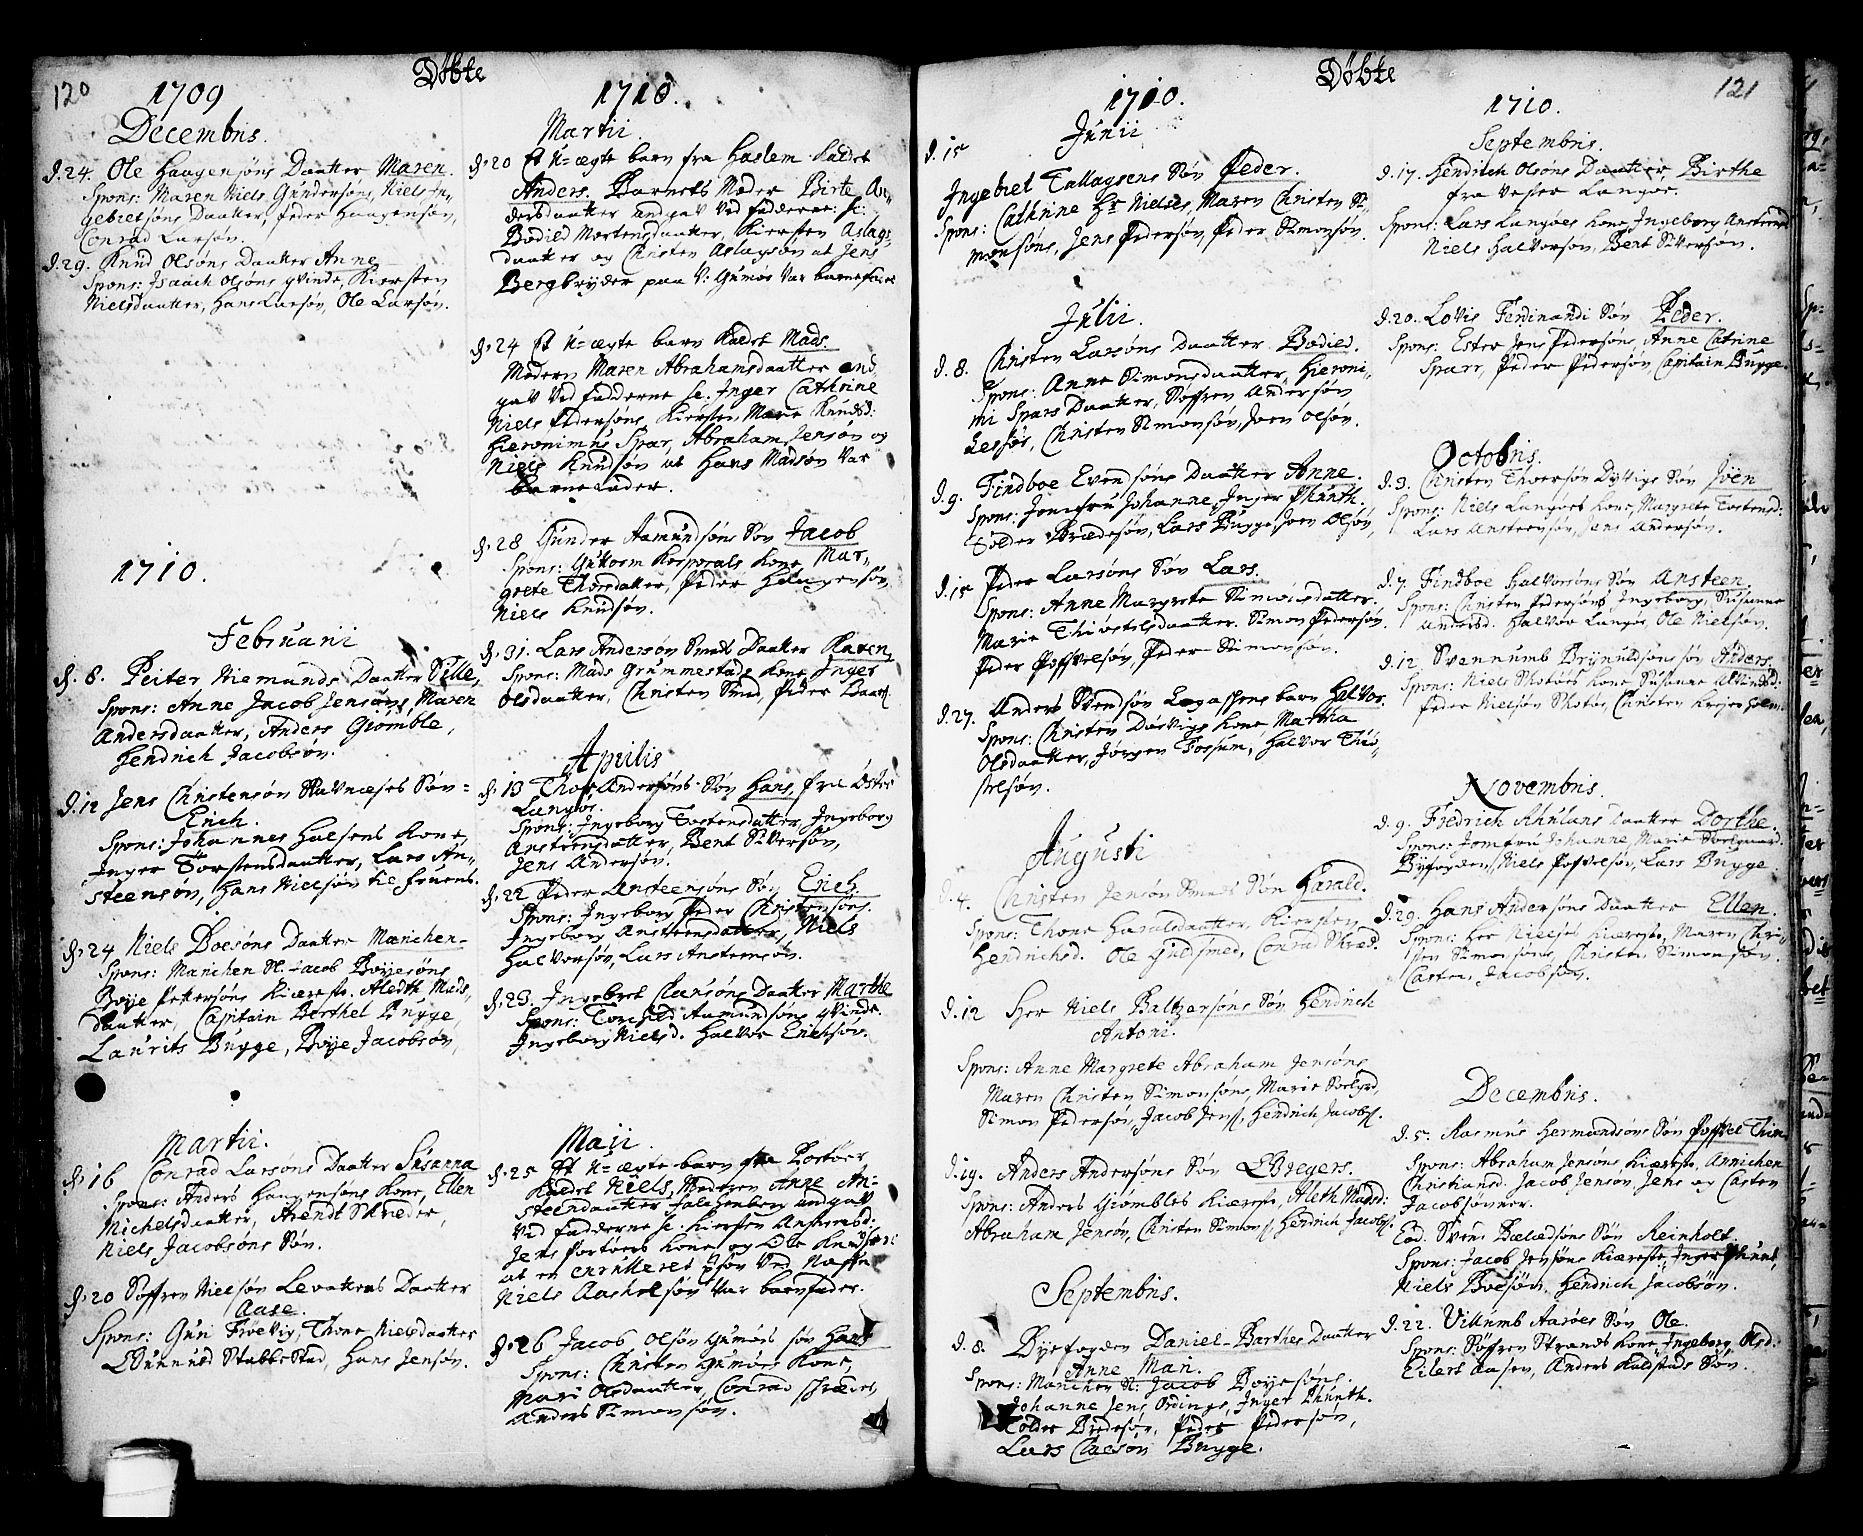 SAKO, Kragerø kirkebøker, F/Fa/L0001: Ministerialbok nr. 1, 1702-1766, s. 120-121